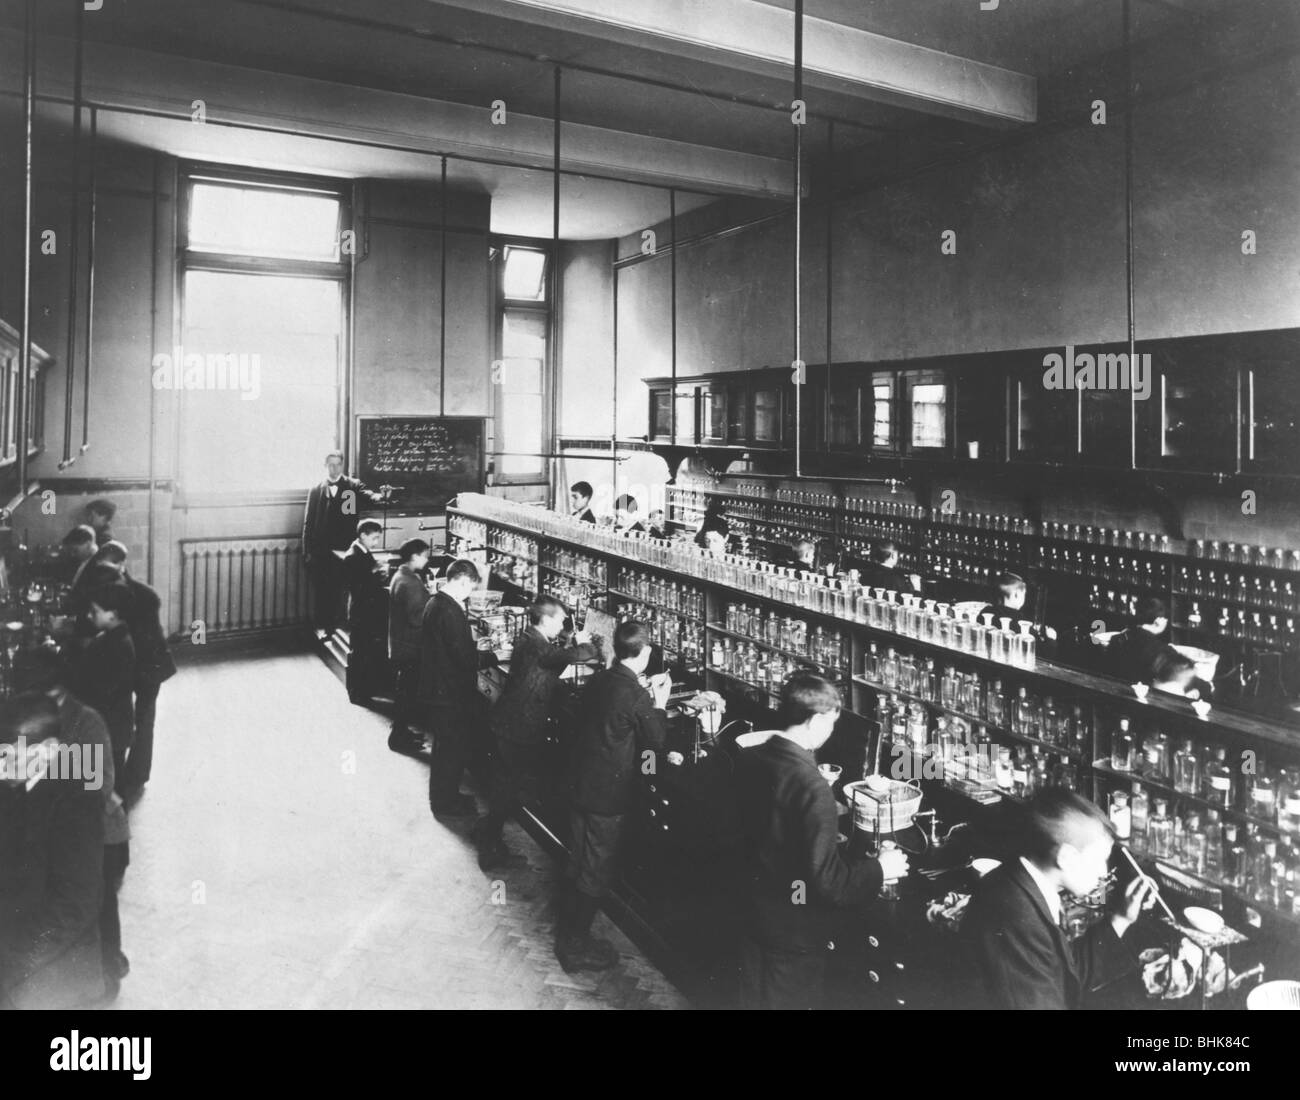 Science laboratory at the Jewish Free School, (c1950s?). - Stock Image